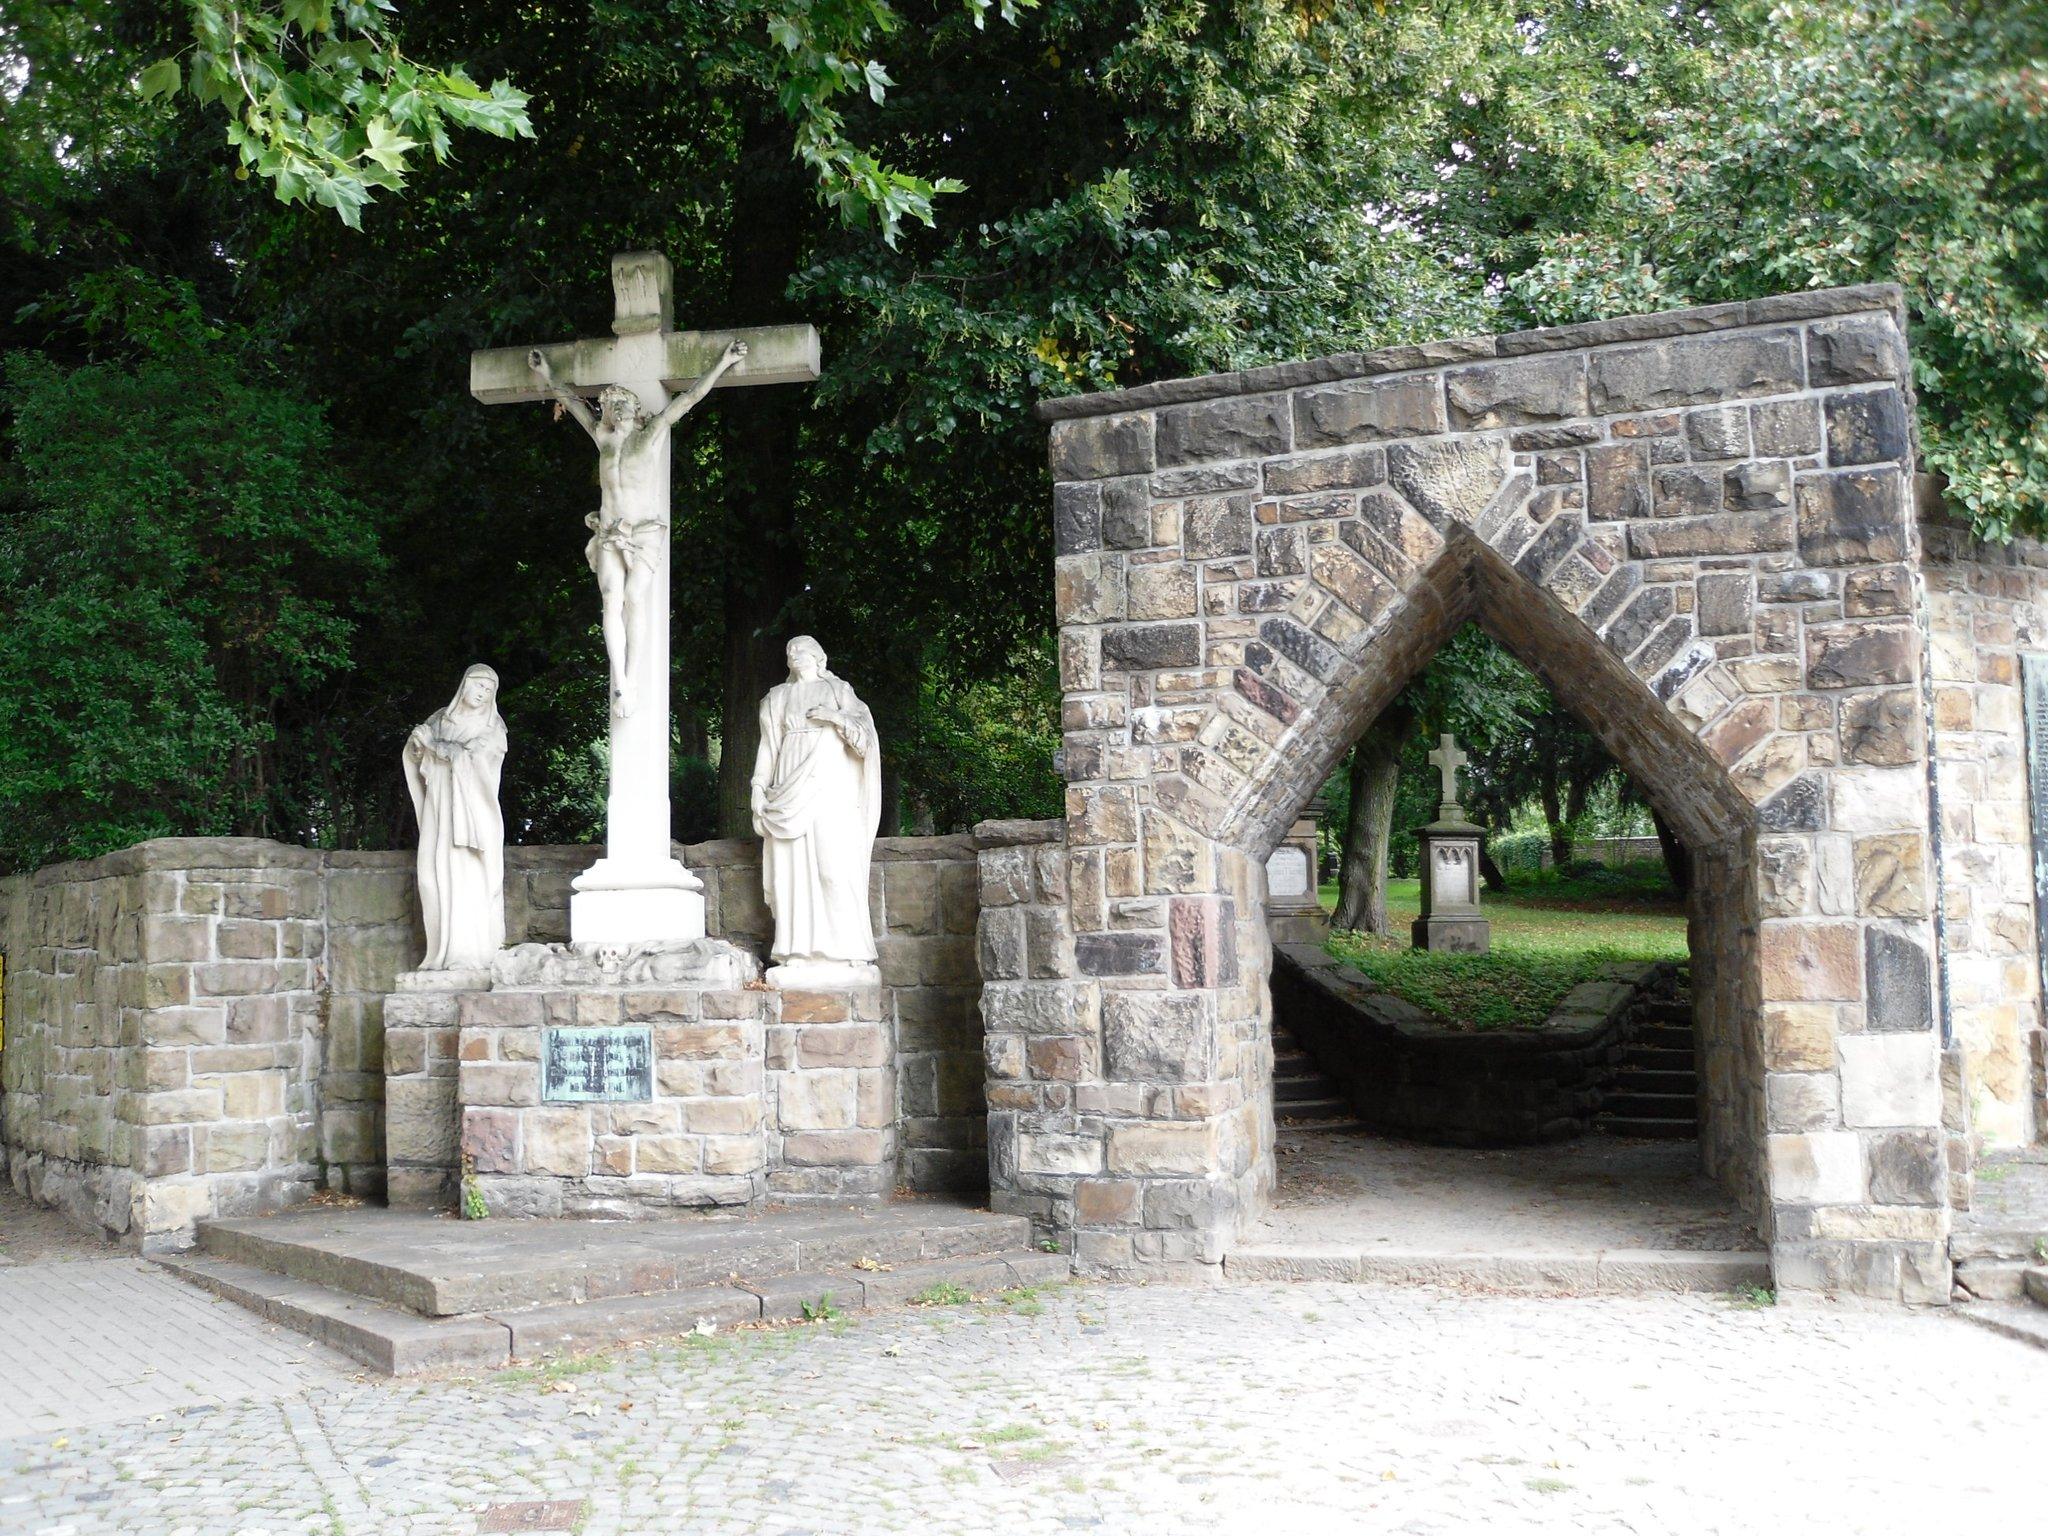 Friedhof Recklinghausen